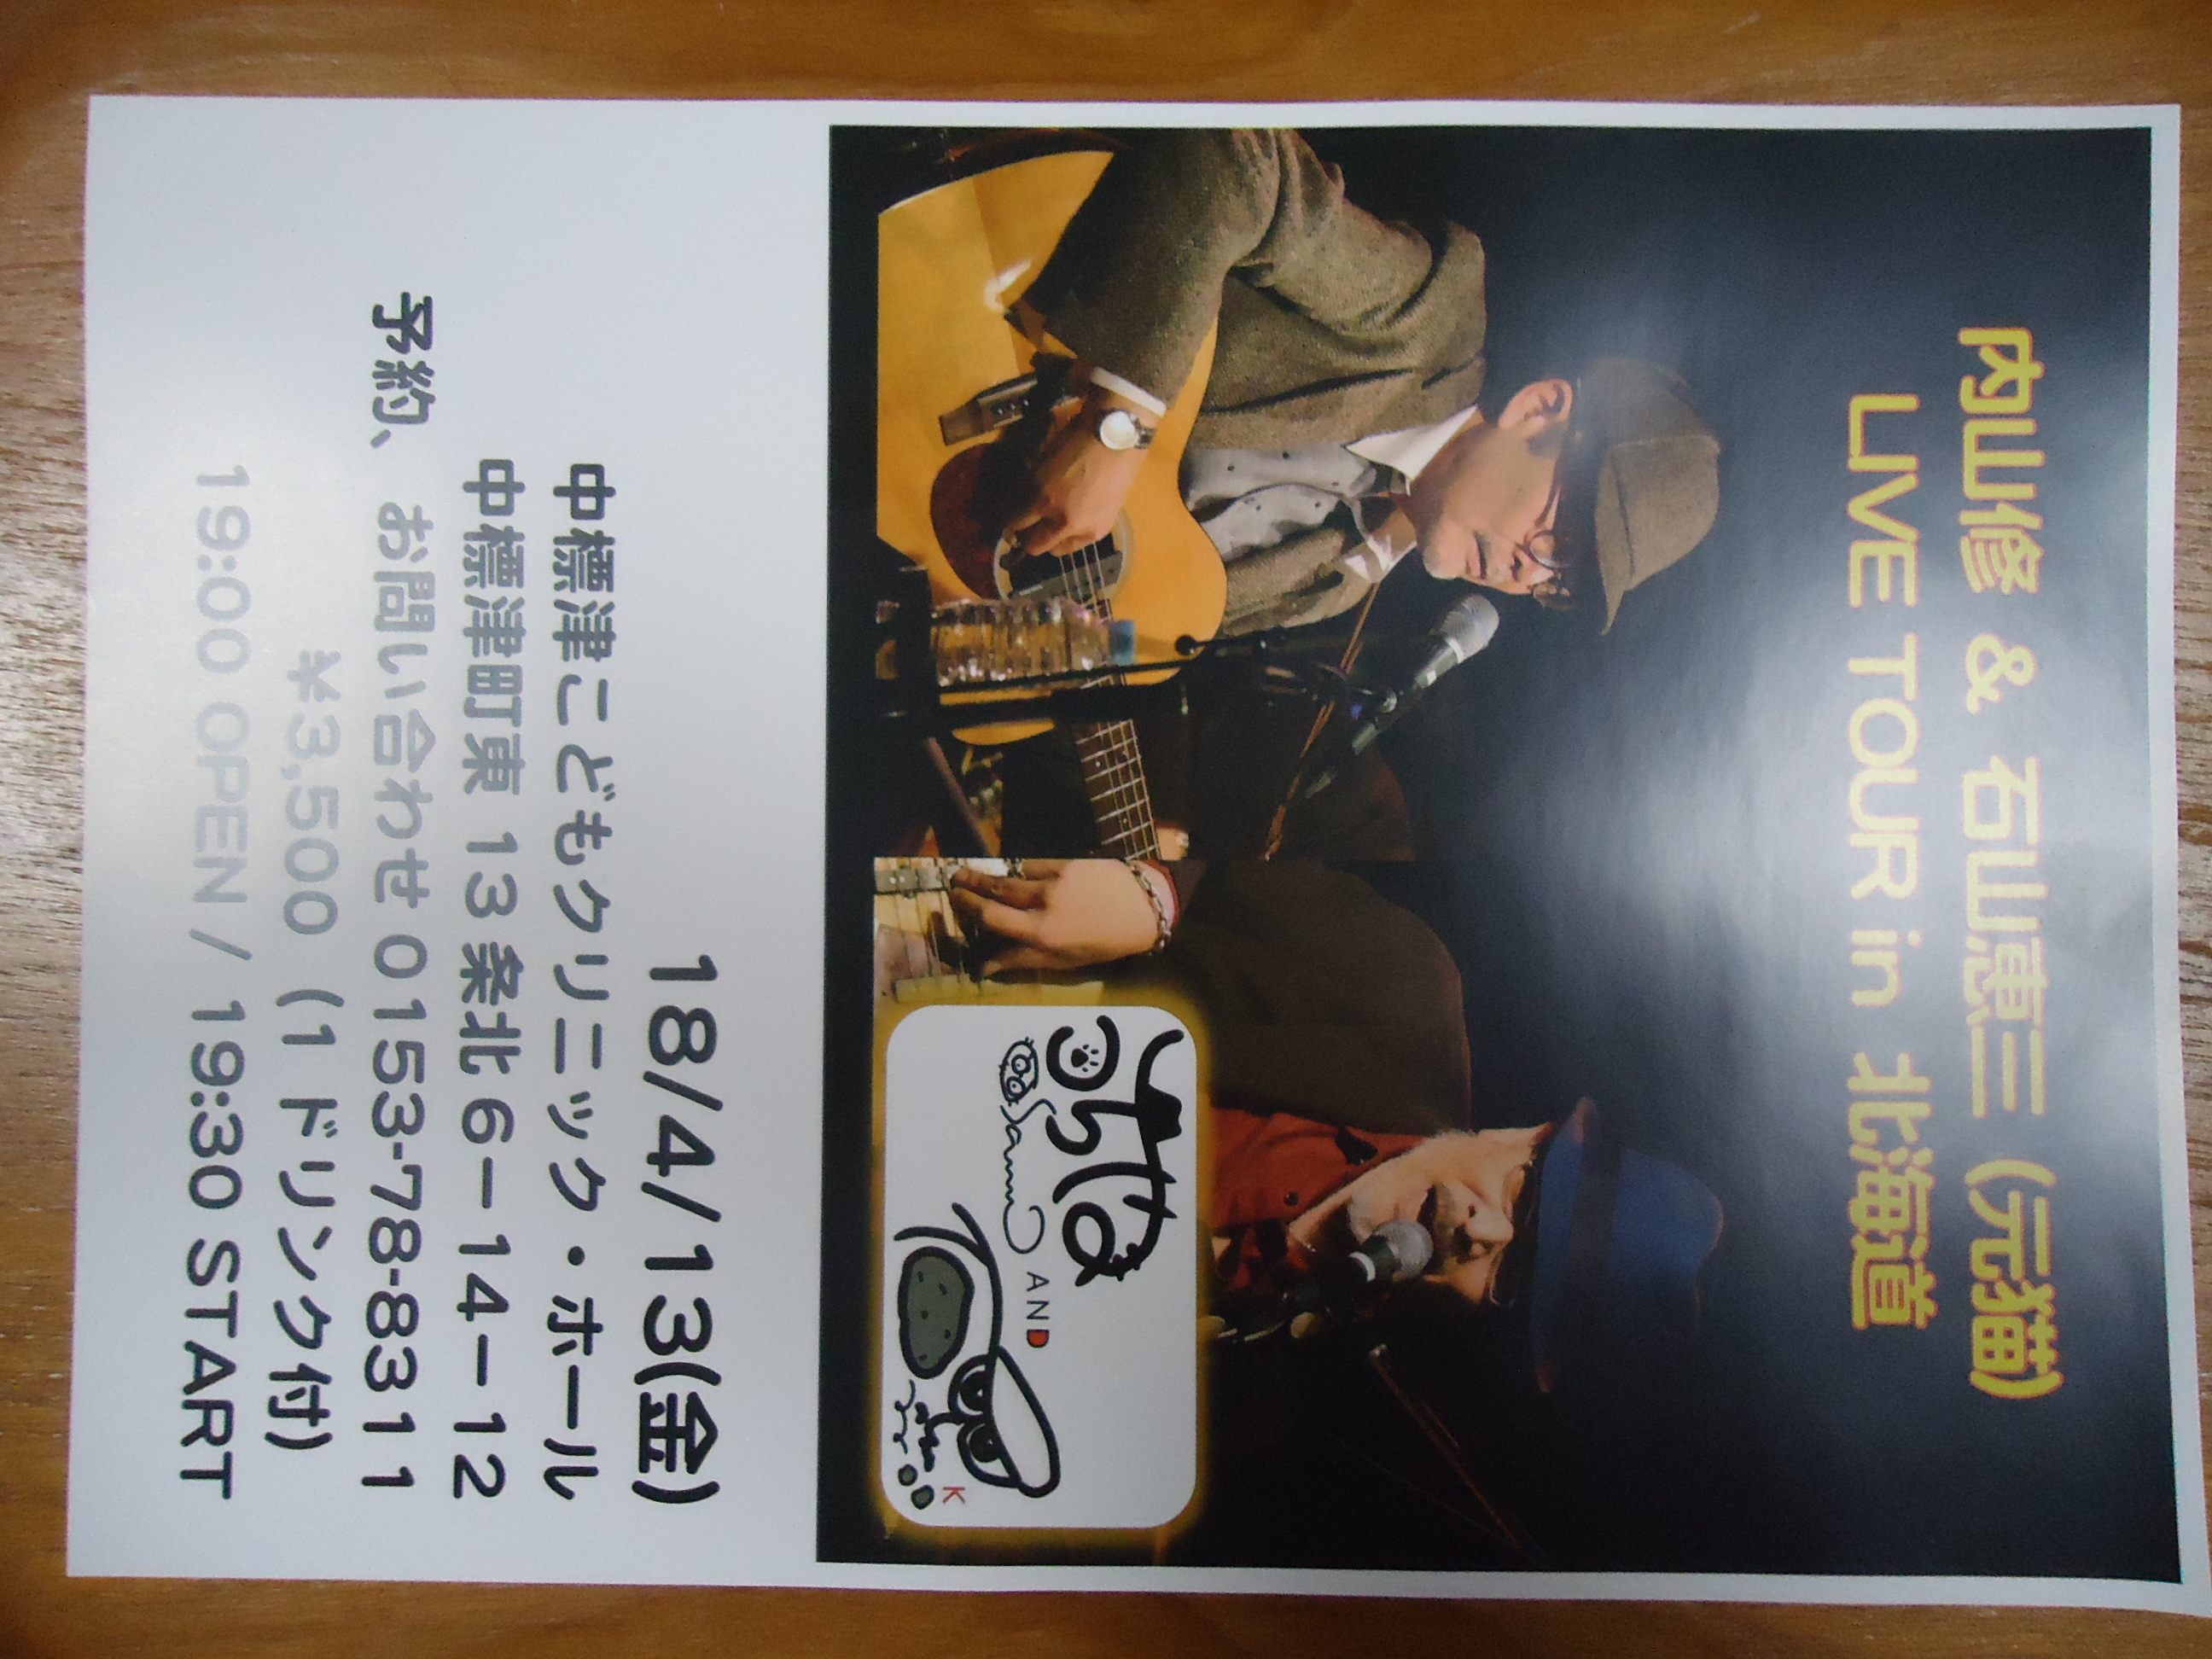 DSC05465.JPG